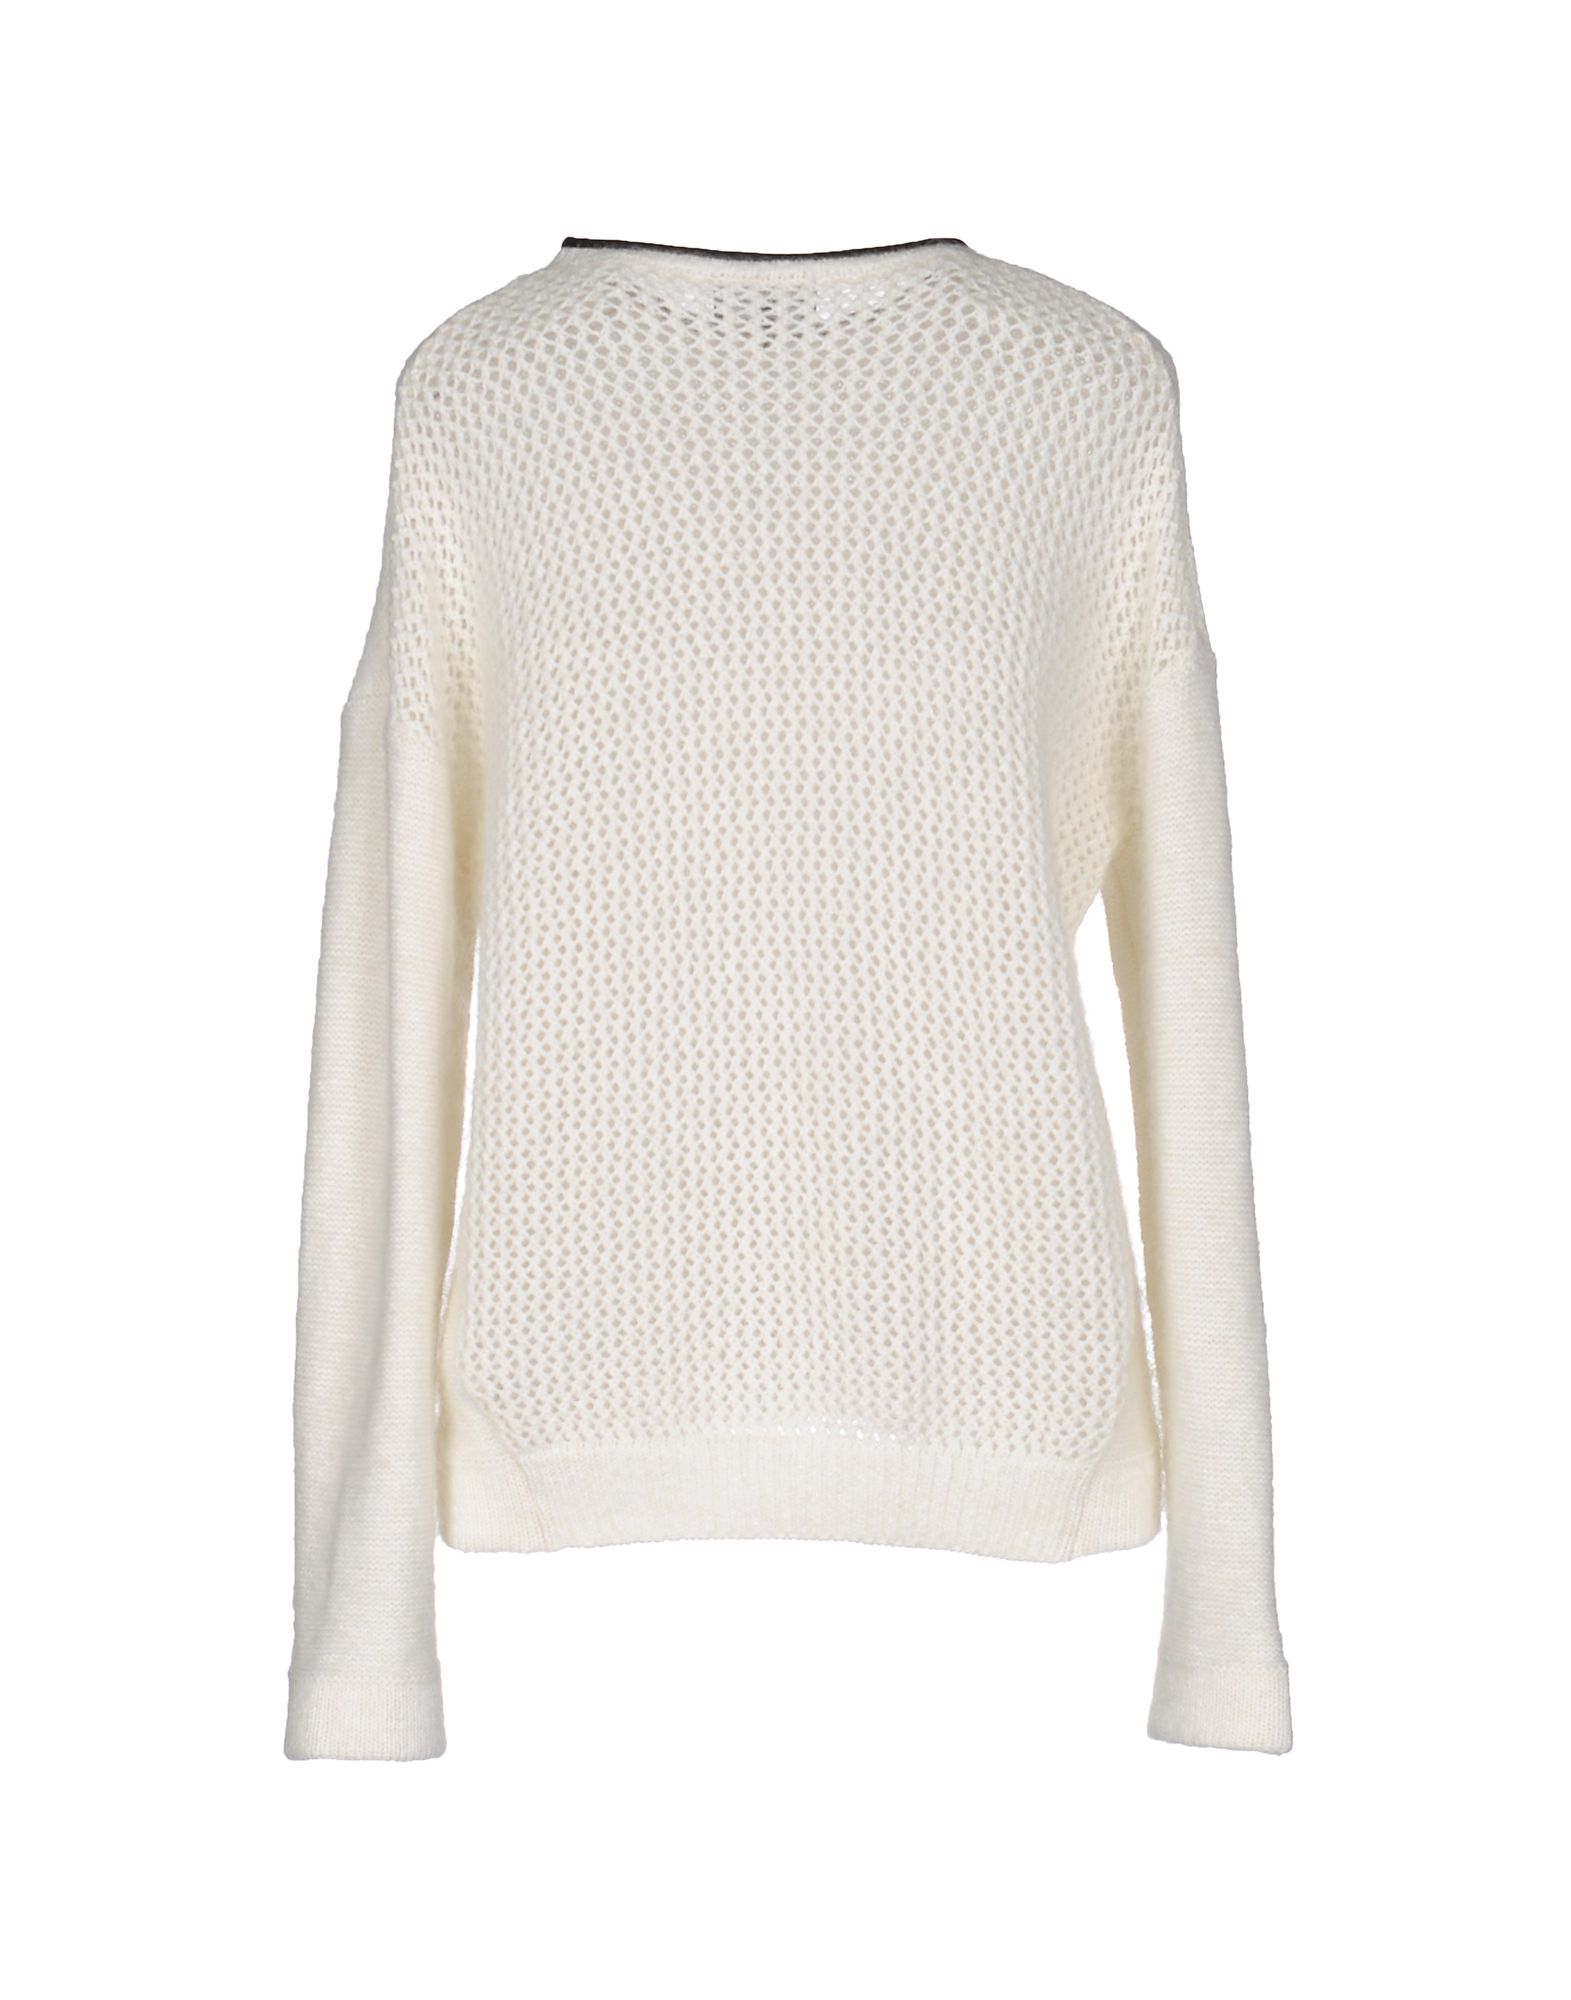 emporio armani sweater in white lyst. Black Bedroom Furniture Sets. Home Design Ideas